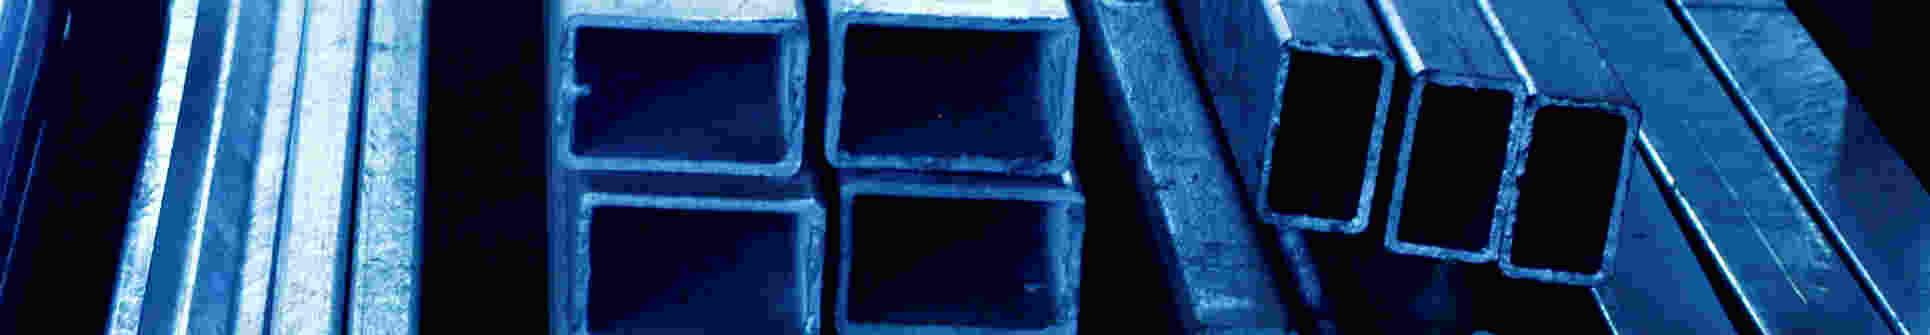 tms th ringer metall stahlservice gmbh. Black Bedroom Furniture Sets. Home Design Ideas